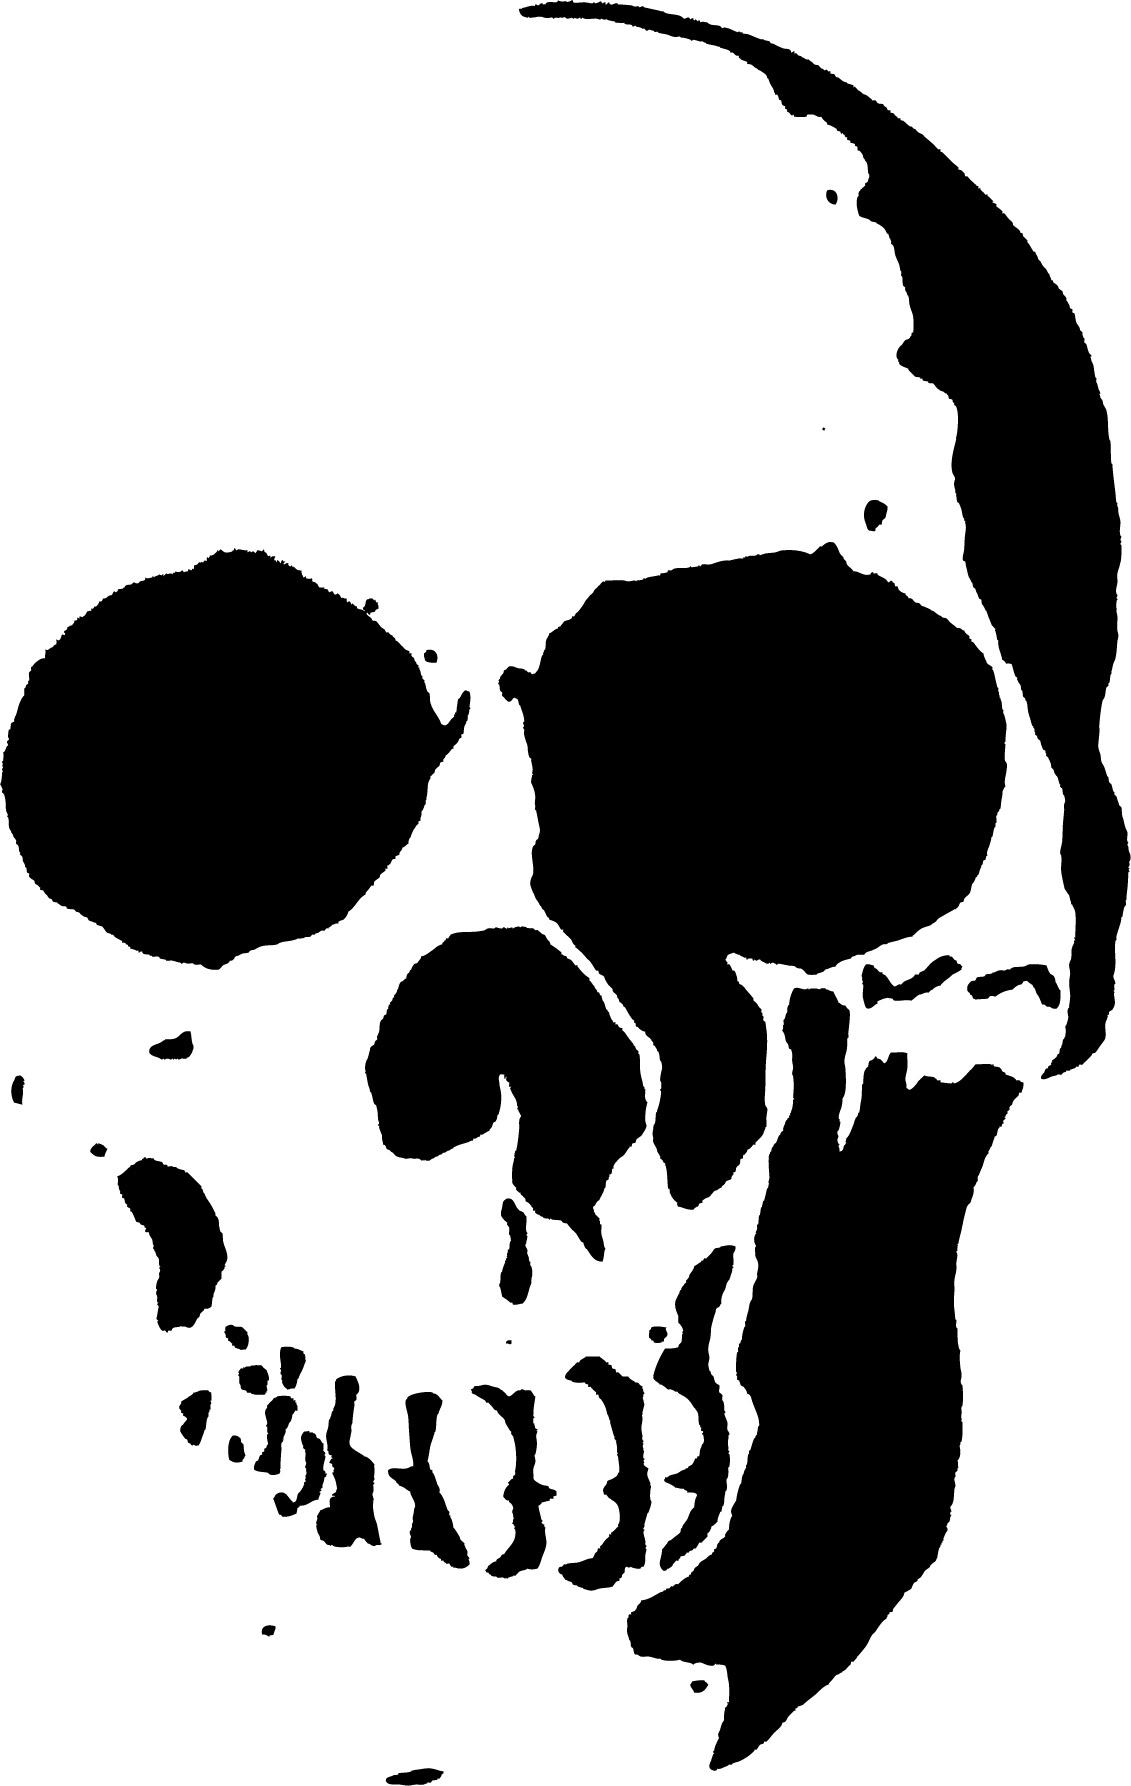 23 Free Skull Stencil Printable Templates | Guide Patterns - Free Printable Stencil Patterns